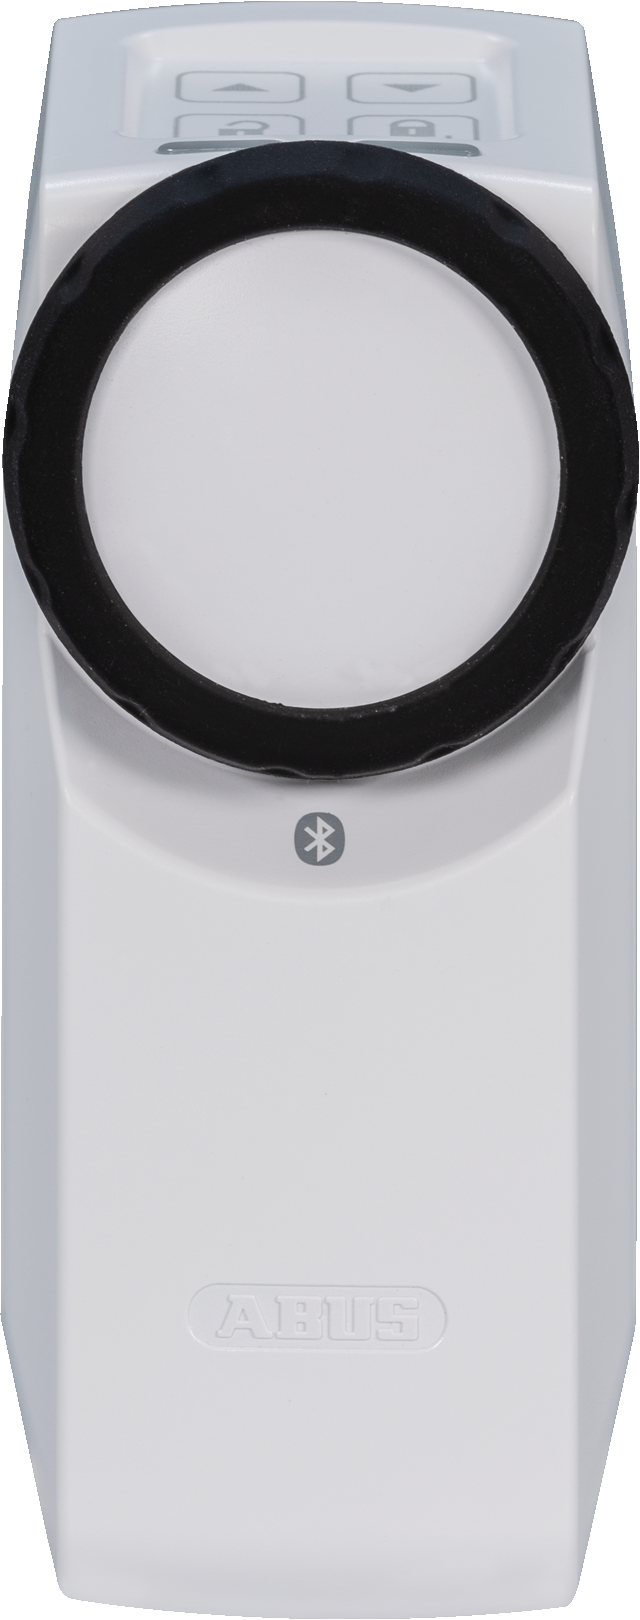 HomeTec Pro Bluetooth®-Türschlossantrieb CFA3100 weiß